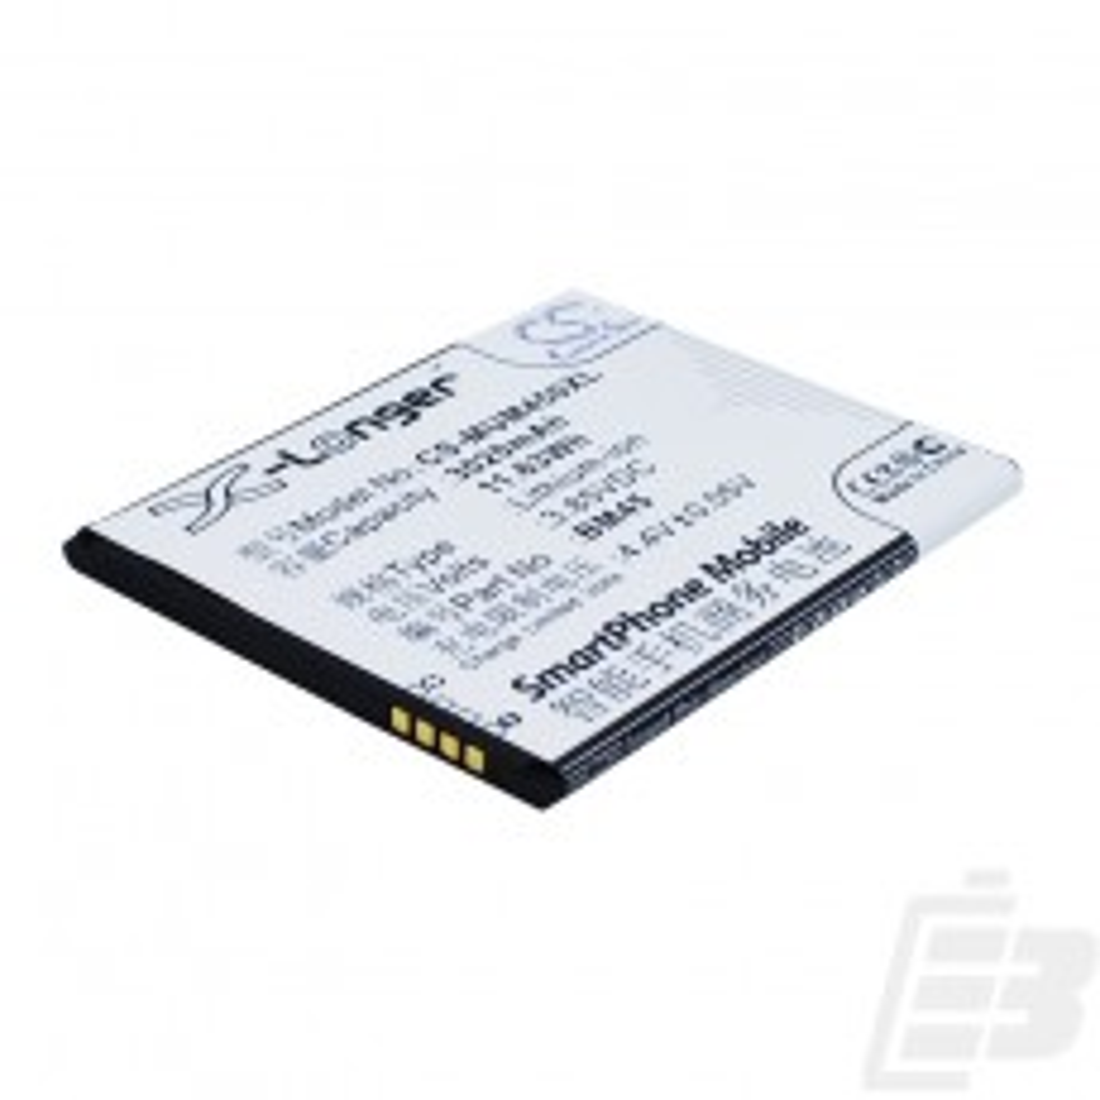 Smartphone battery Xiaomi Note 2_1